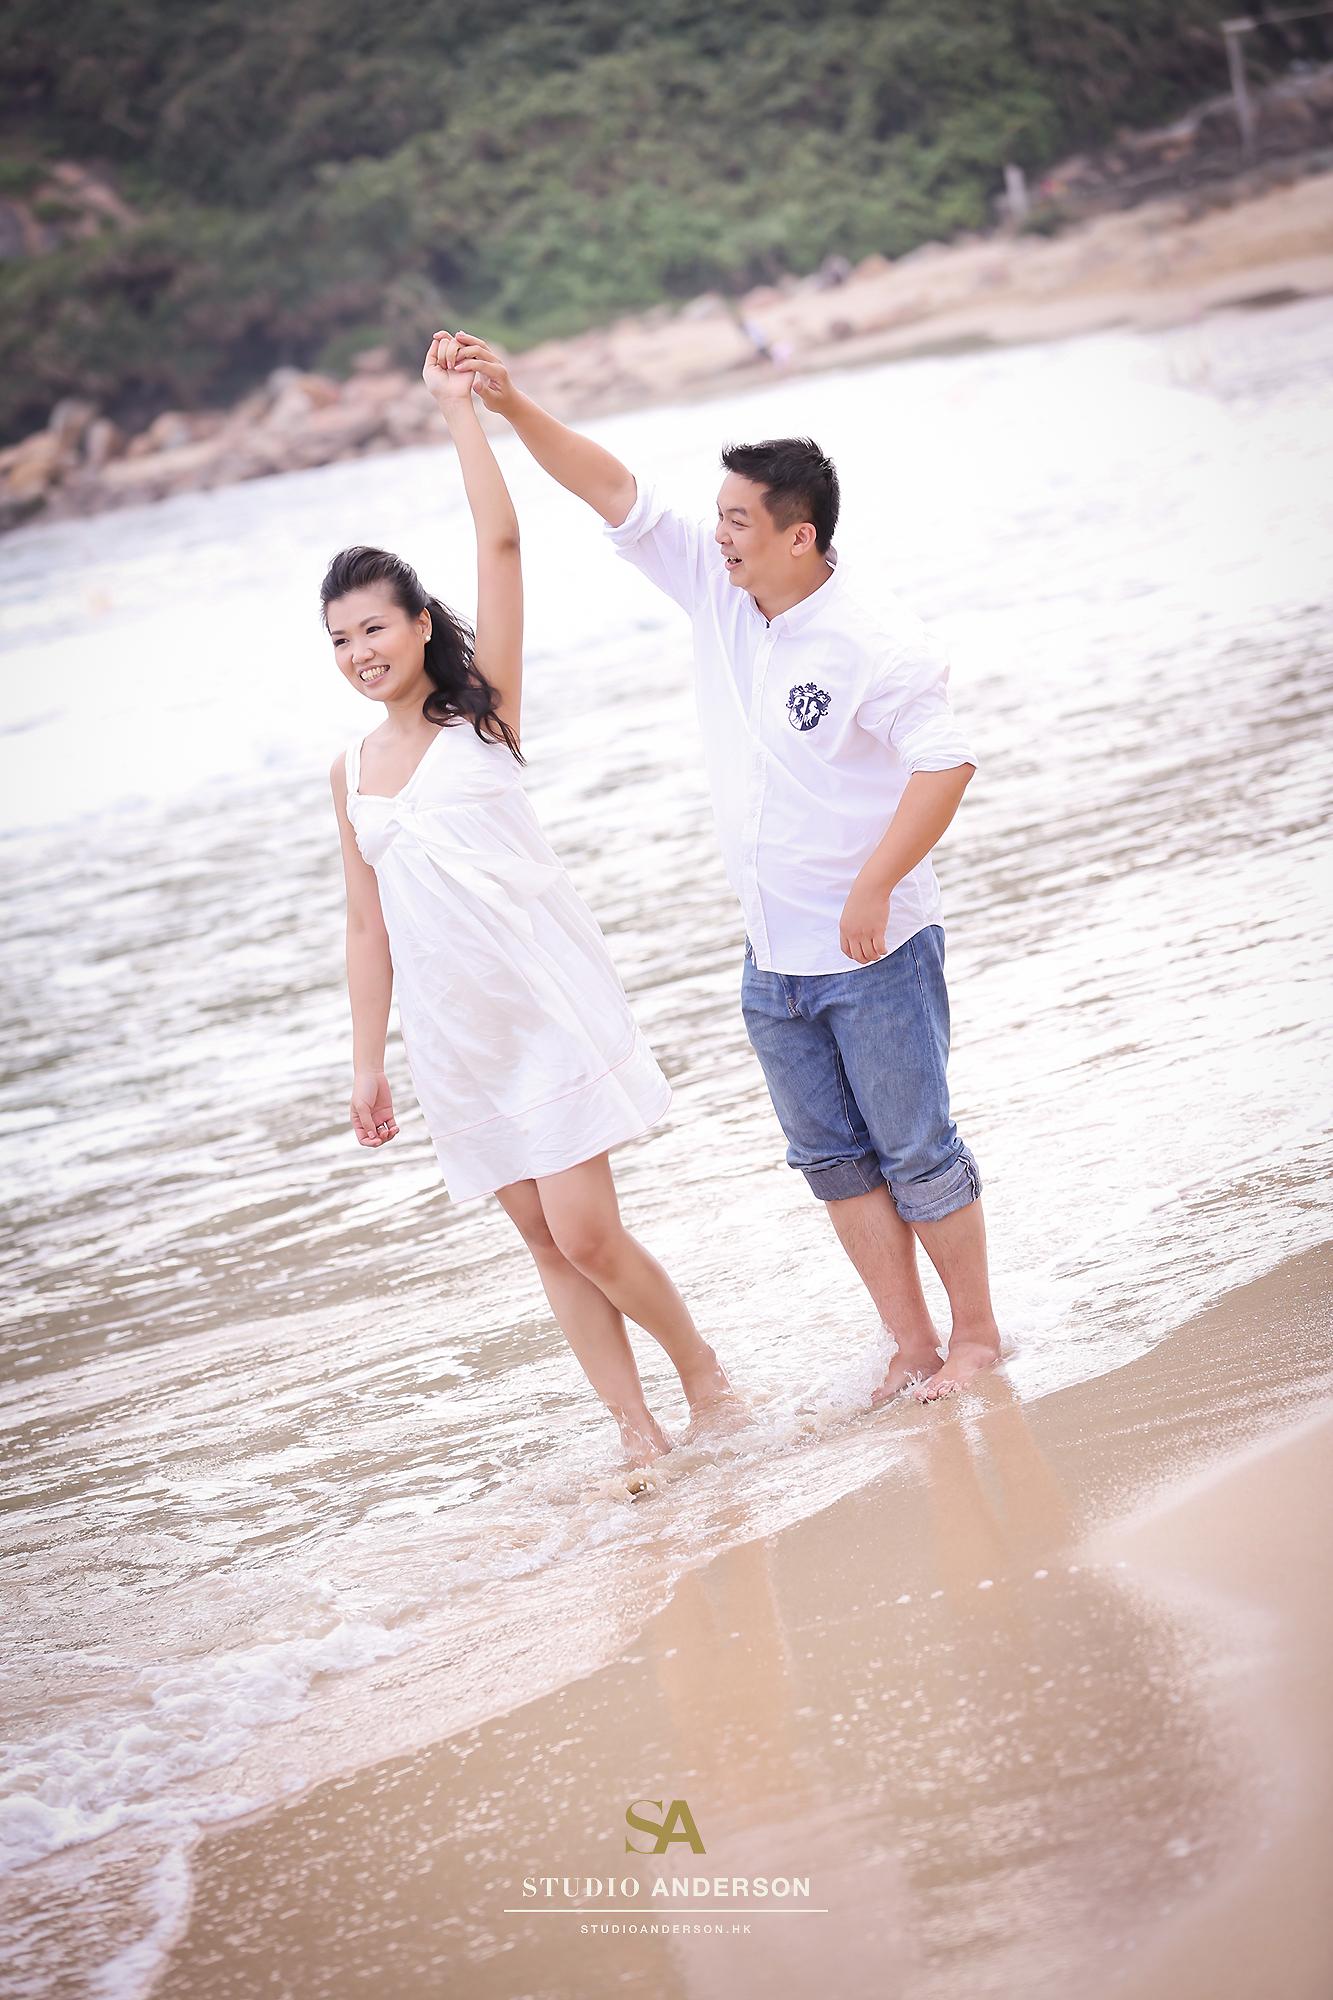 099 - Mandy and Joe Engagement (Watermark).jpg